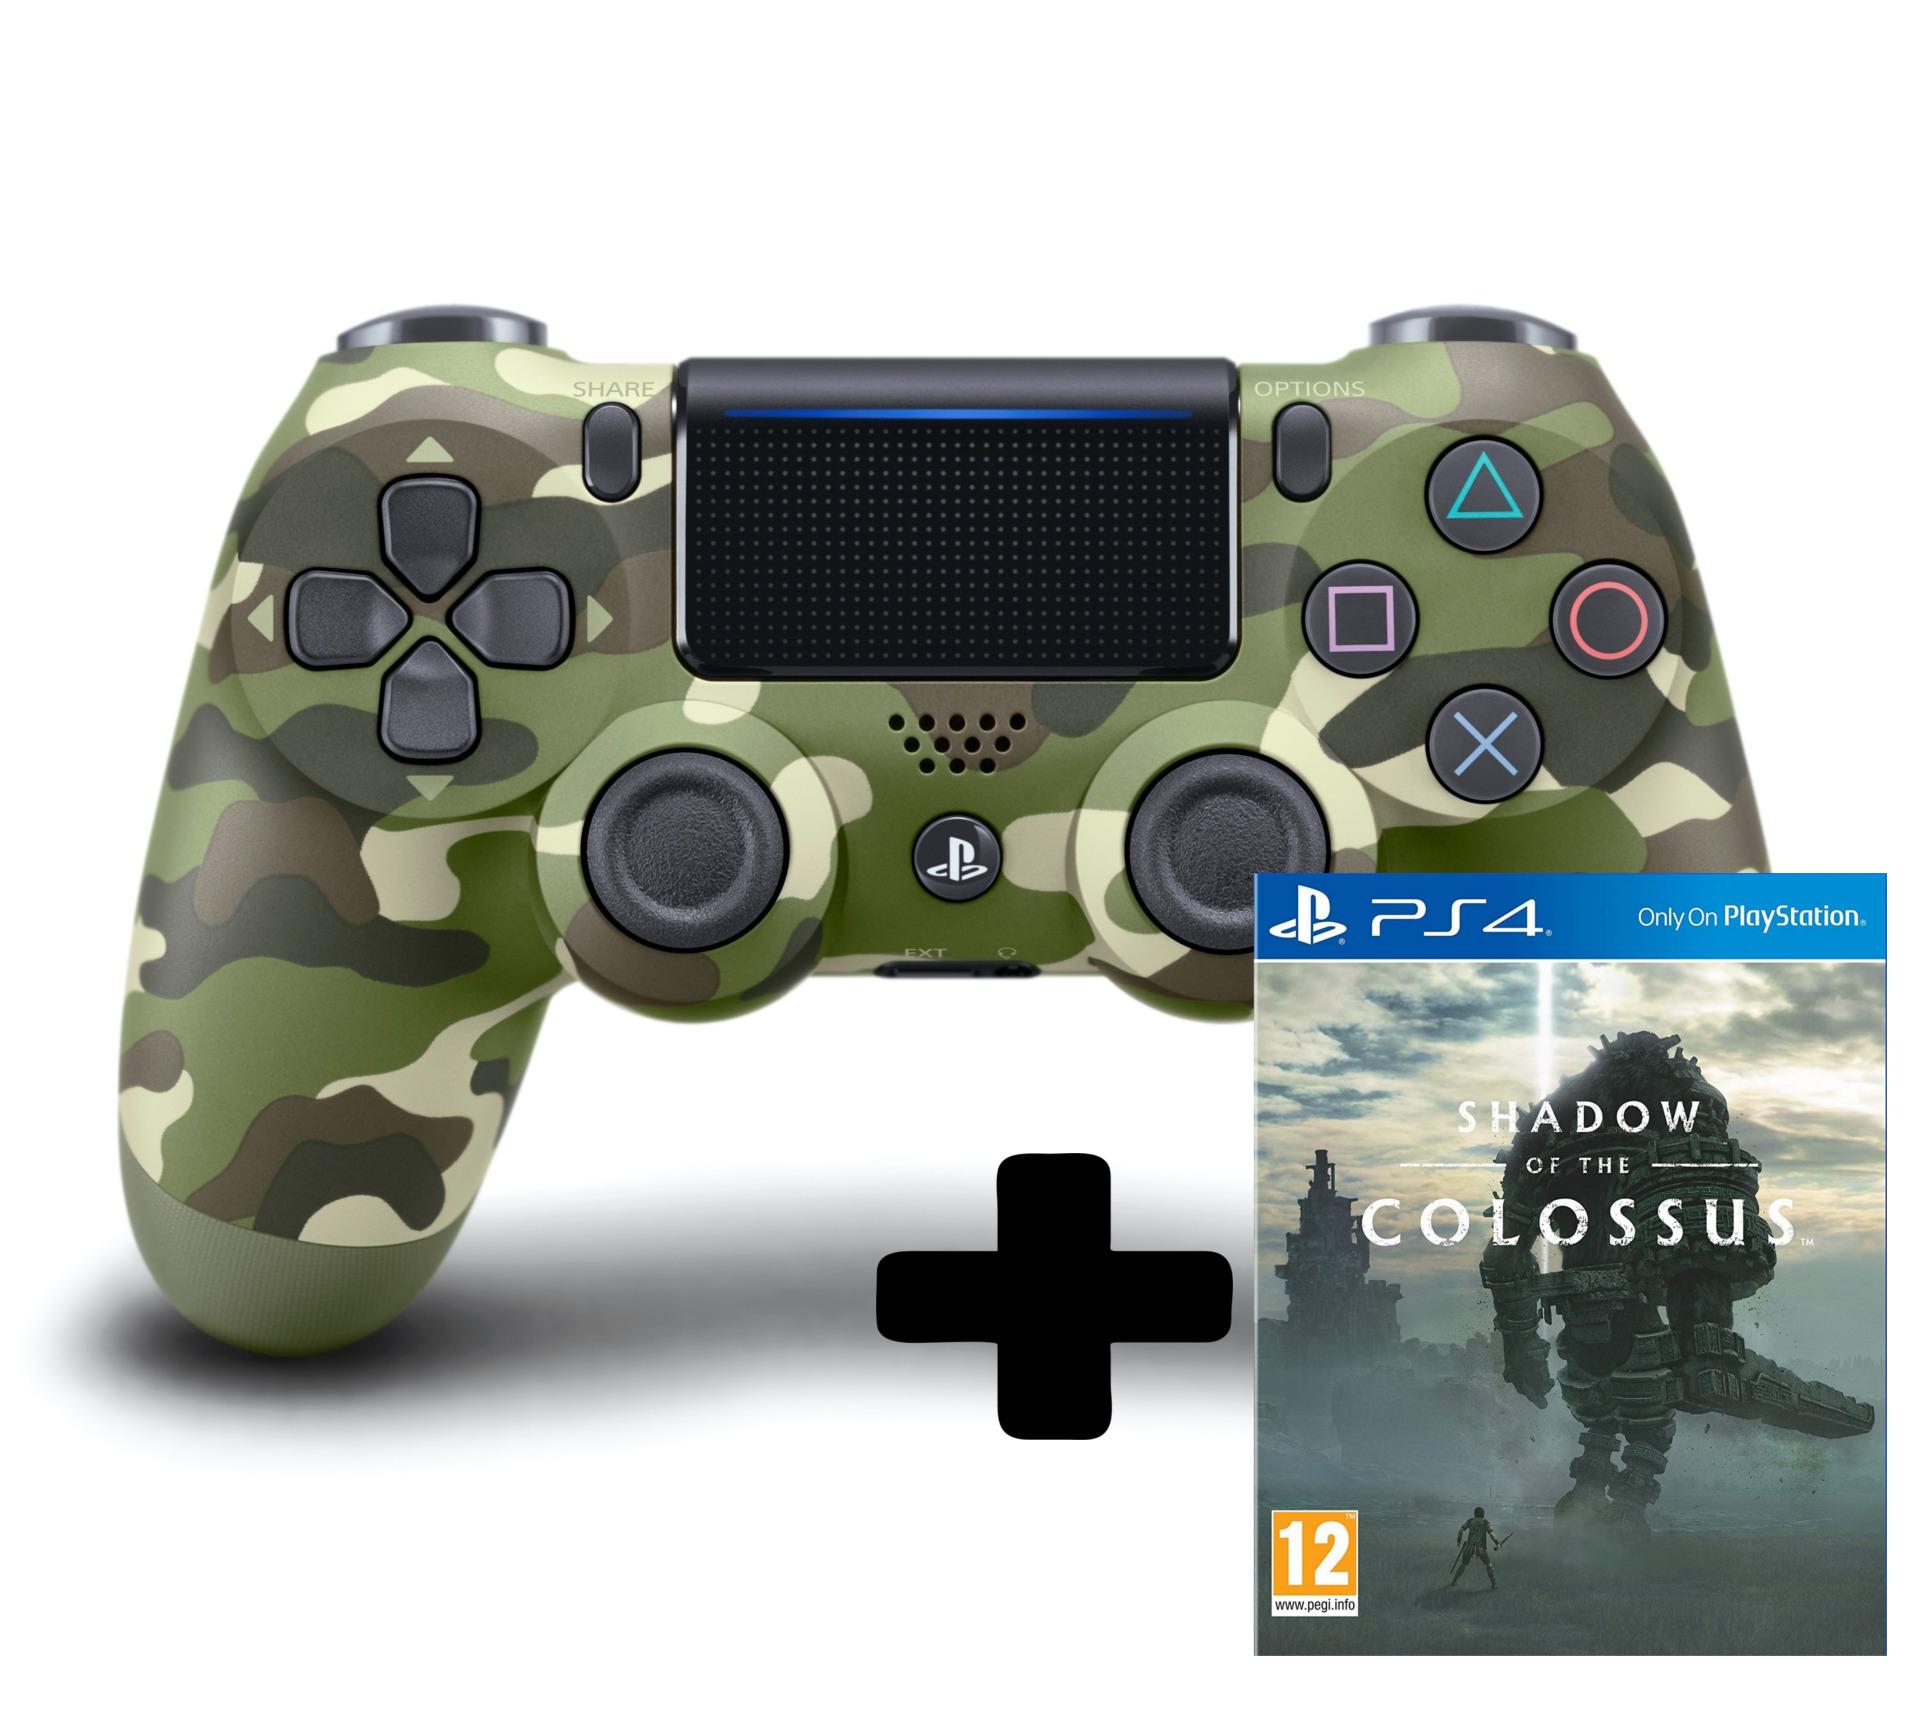 DualShock 4 ovladač - Green Cammo V2 + Shadow of the Colossus (PS4)